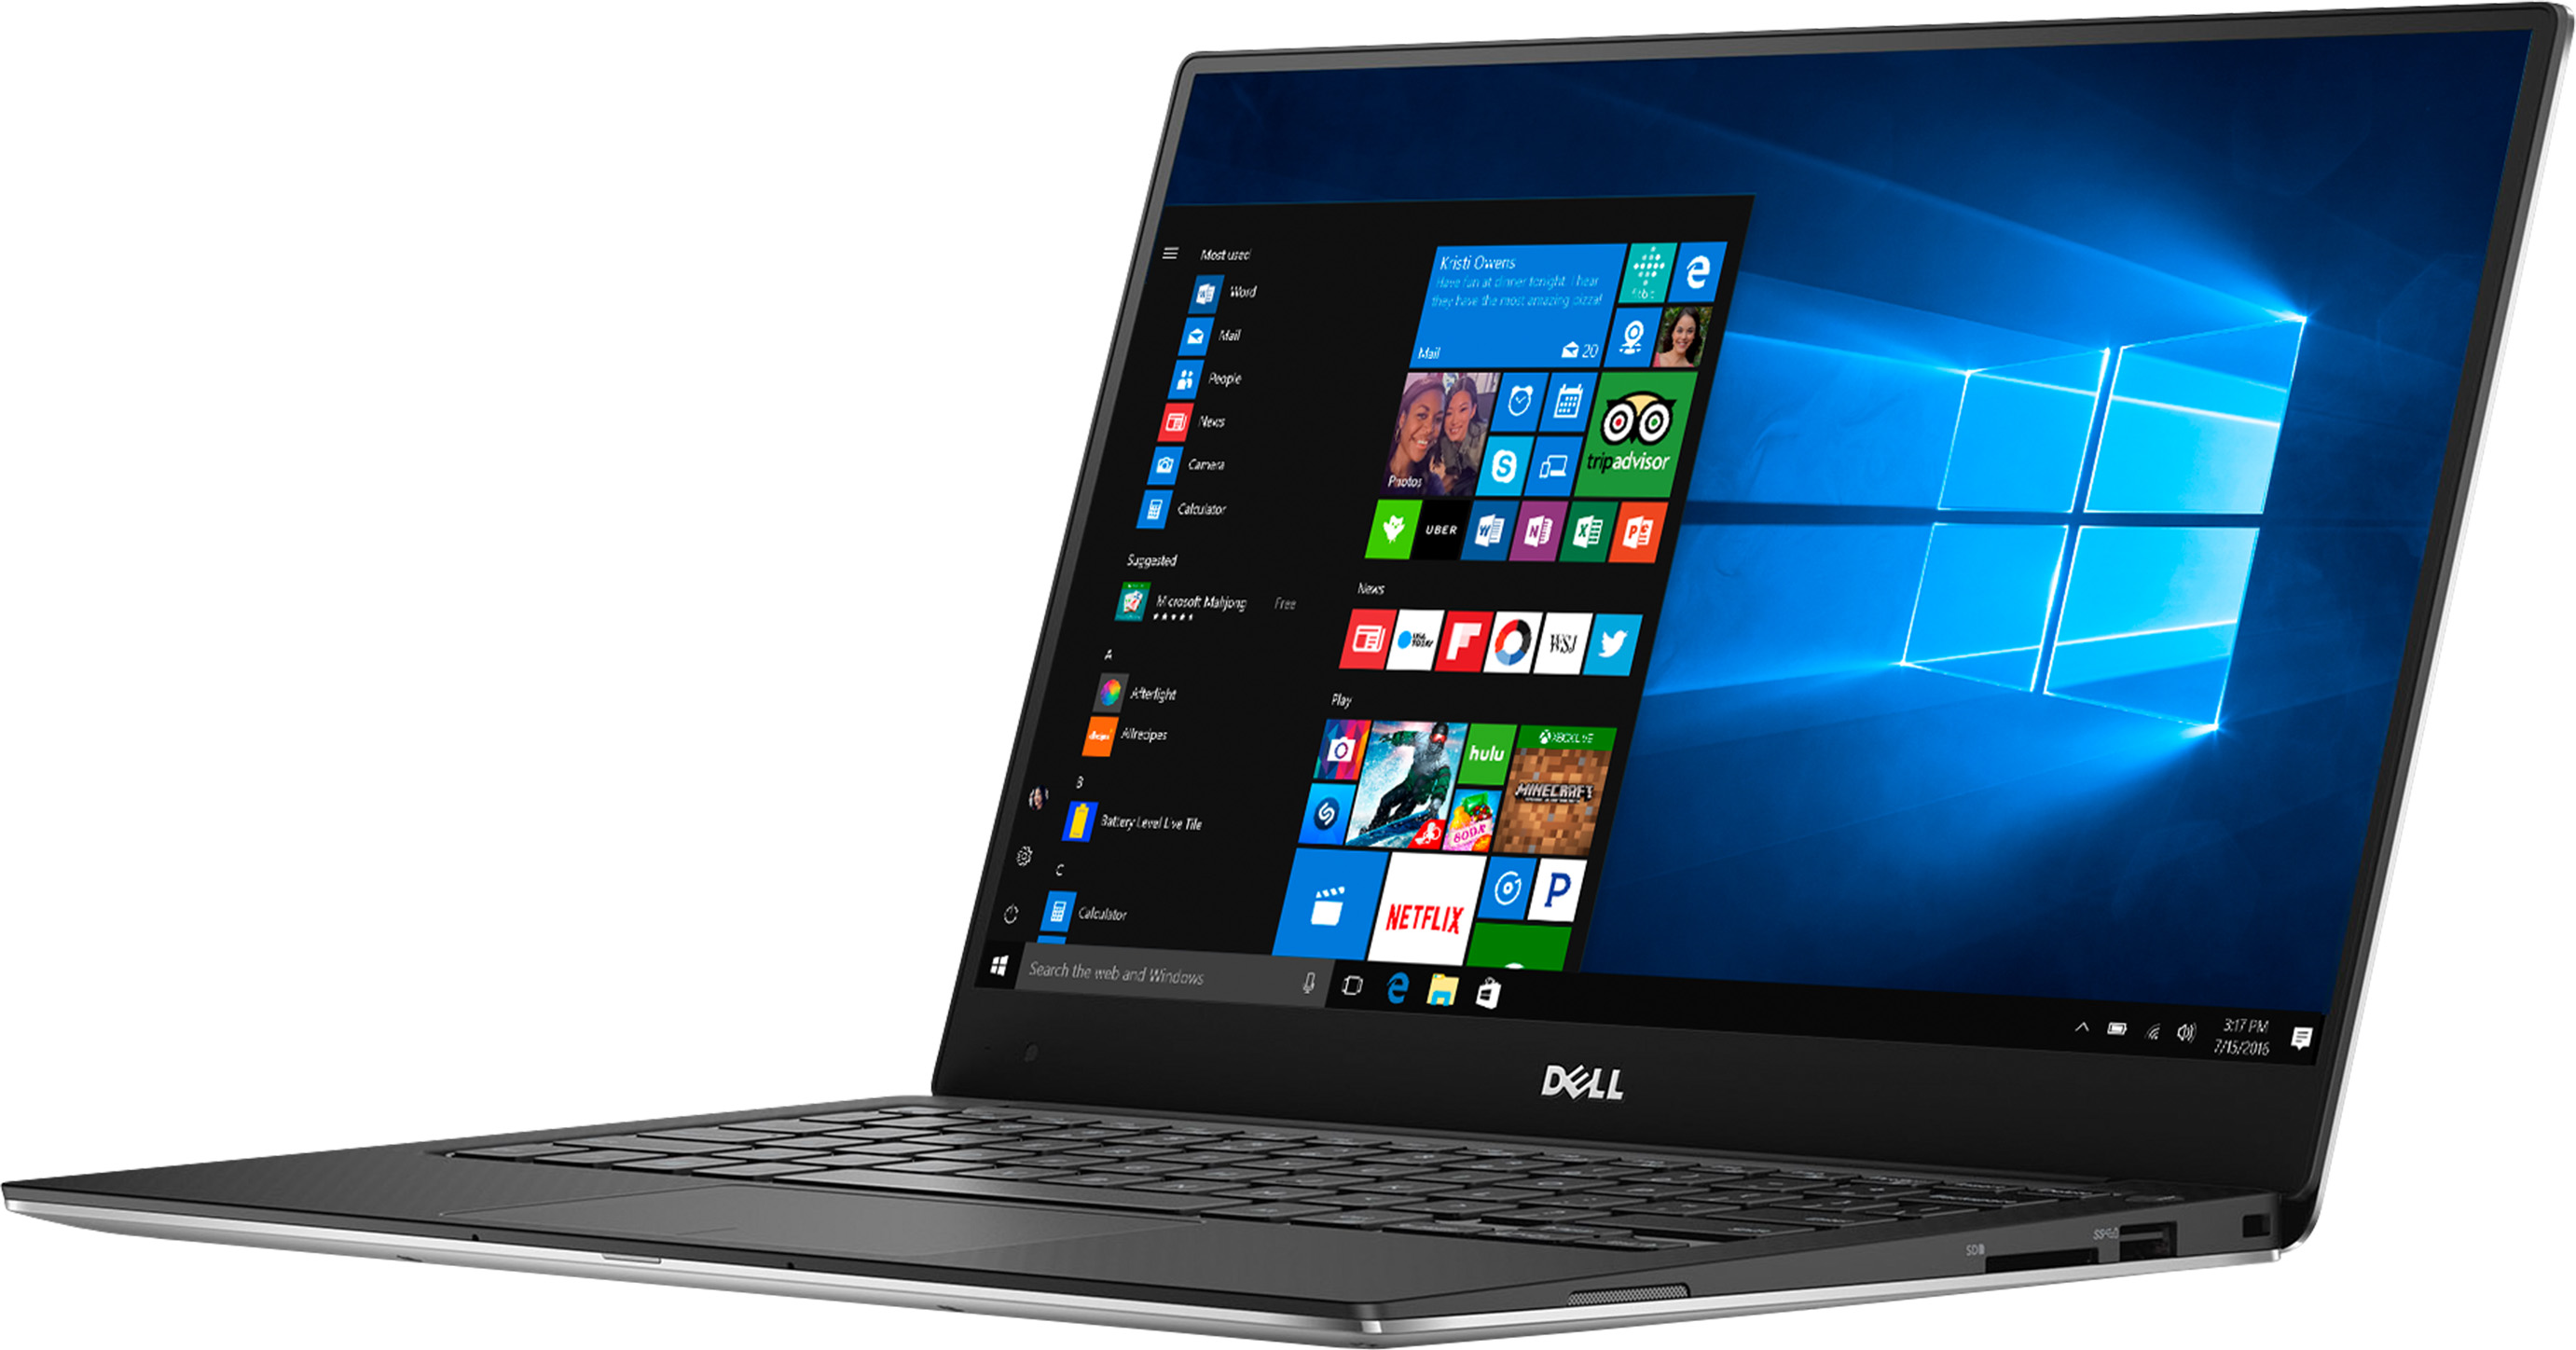 Dell XPS 13 9360-7935SLV Laptop